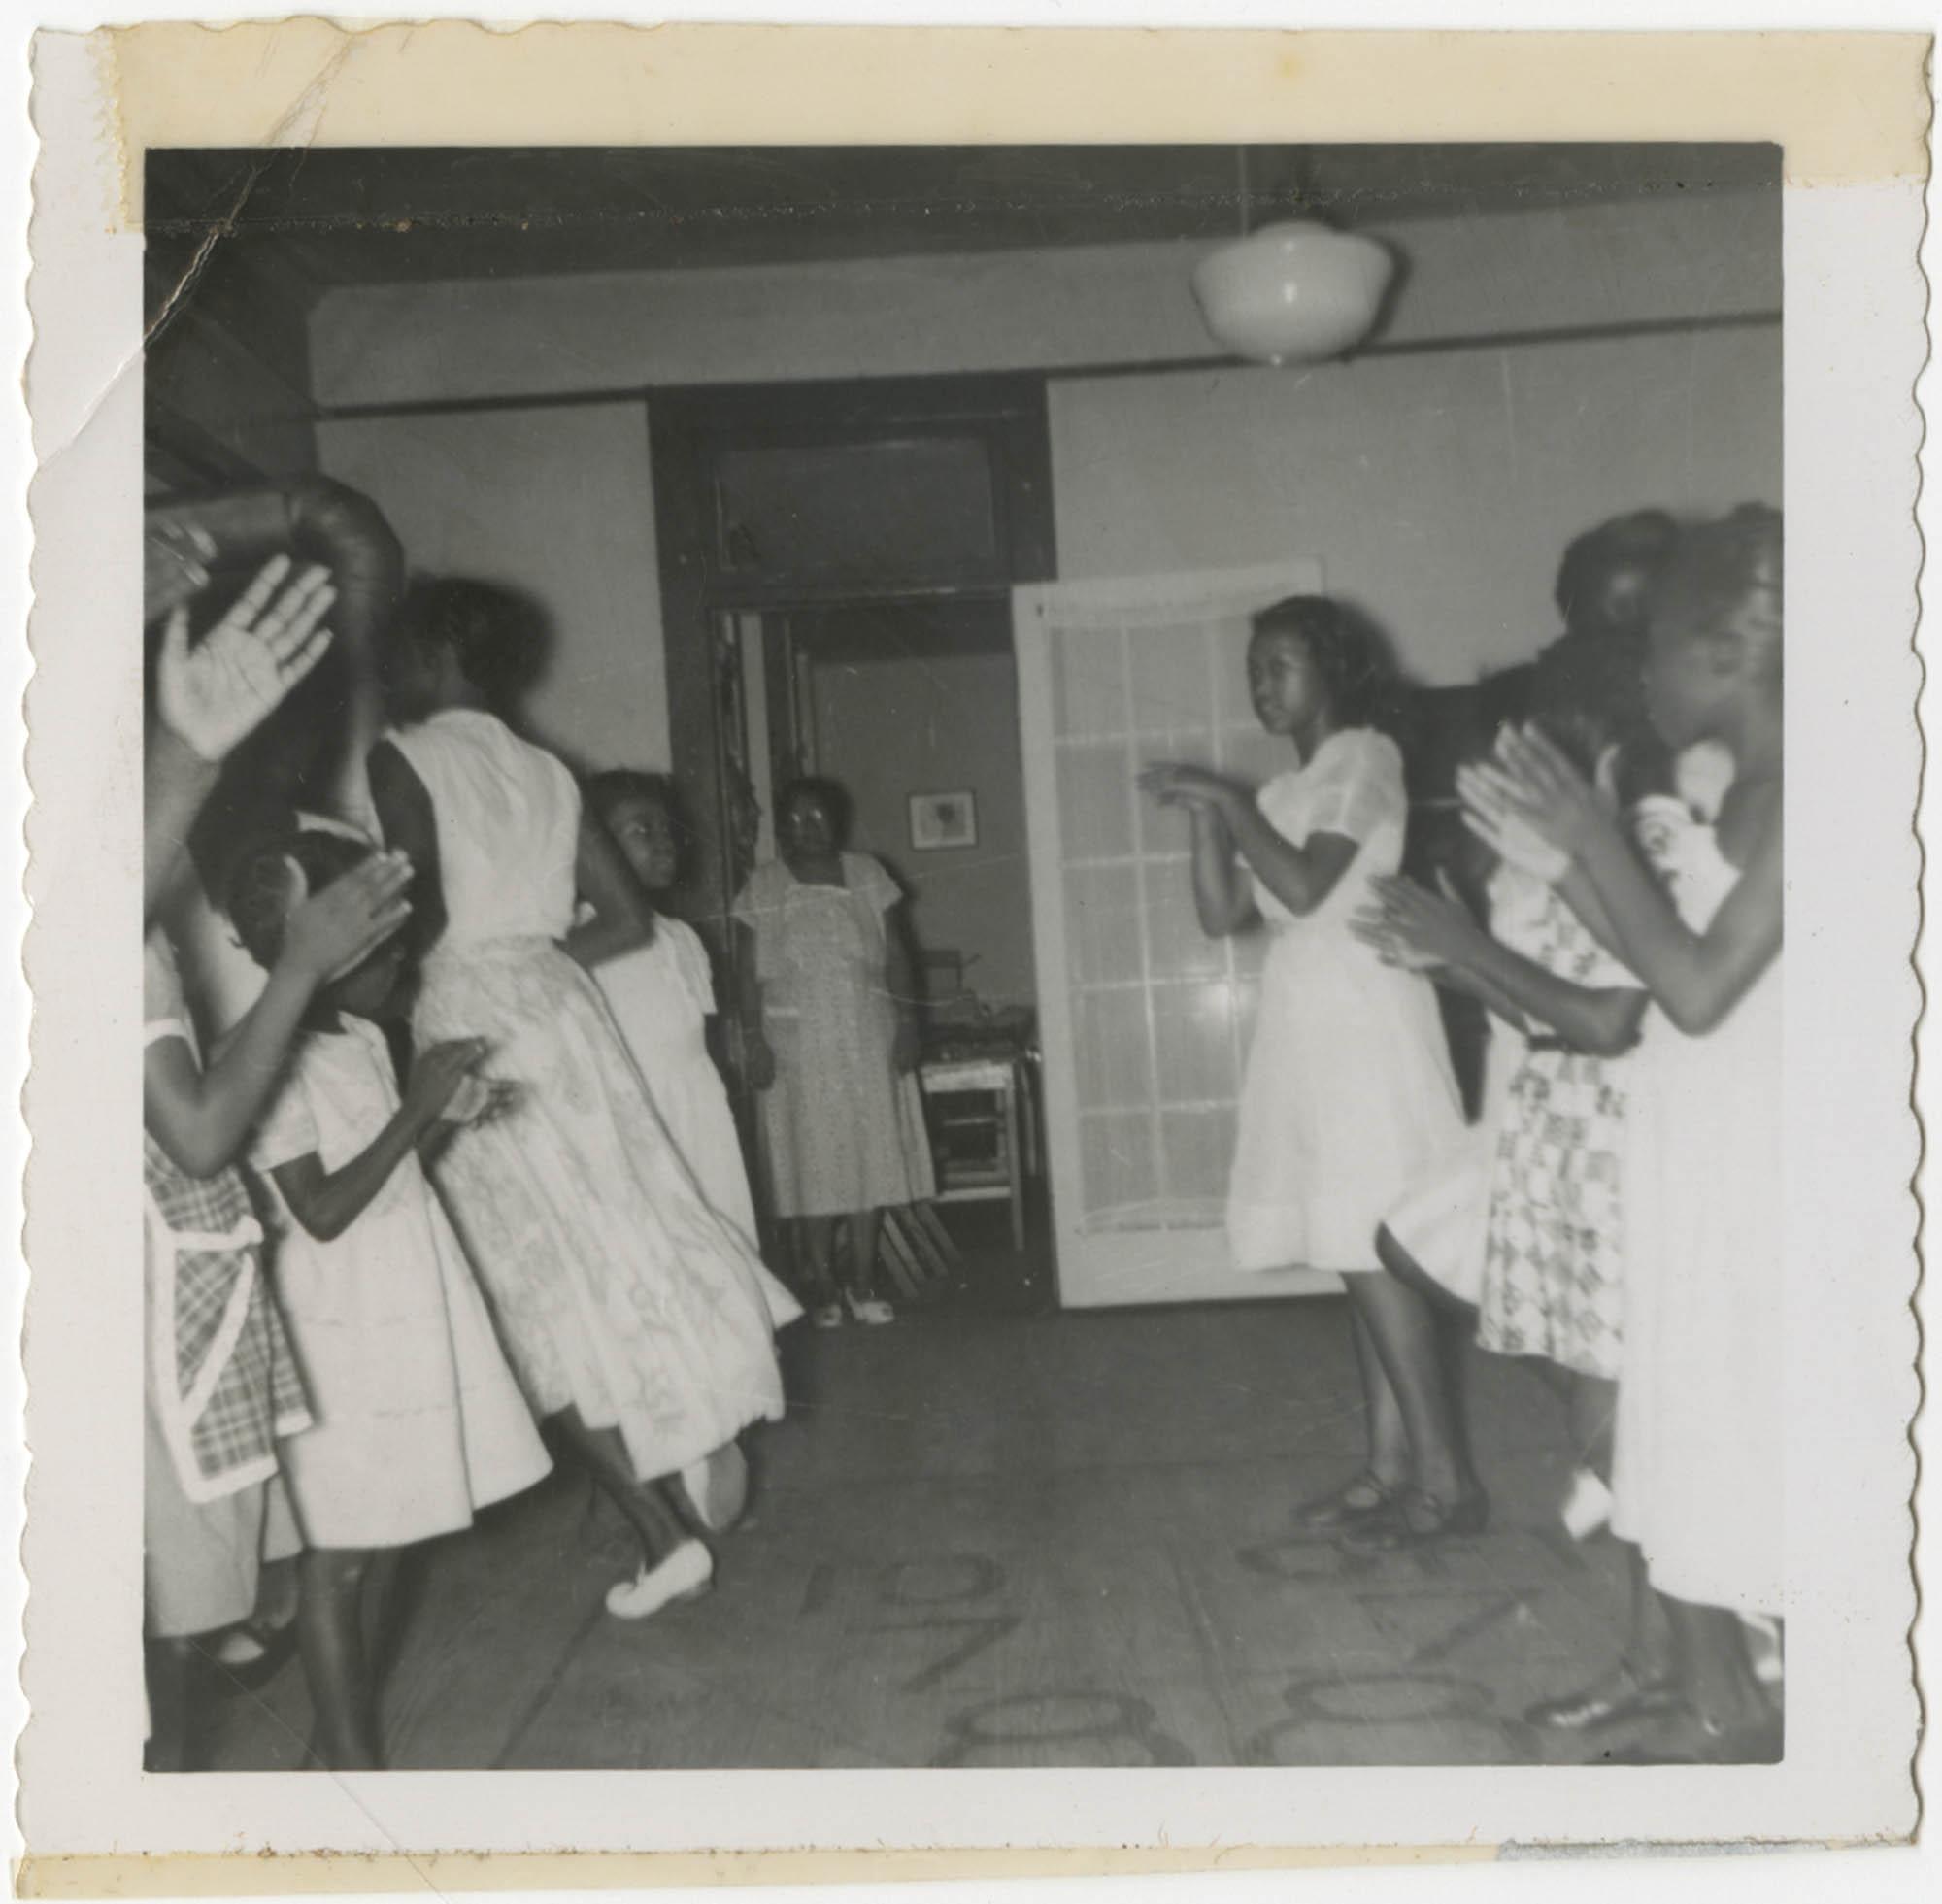 Photograph of Y.W.C.A. Children